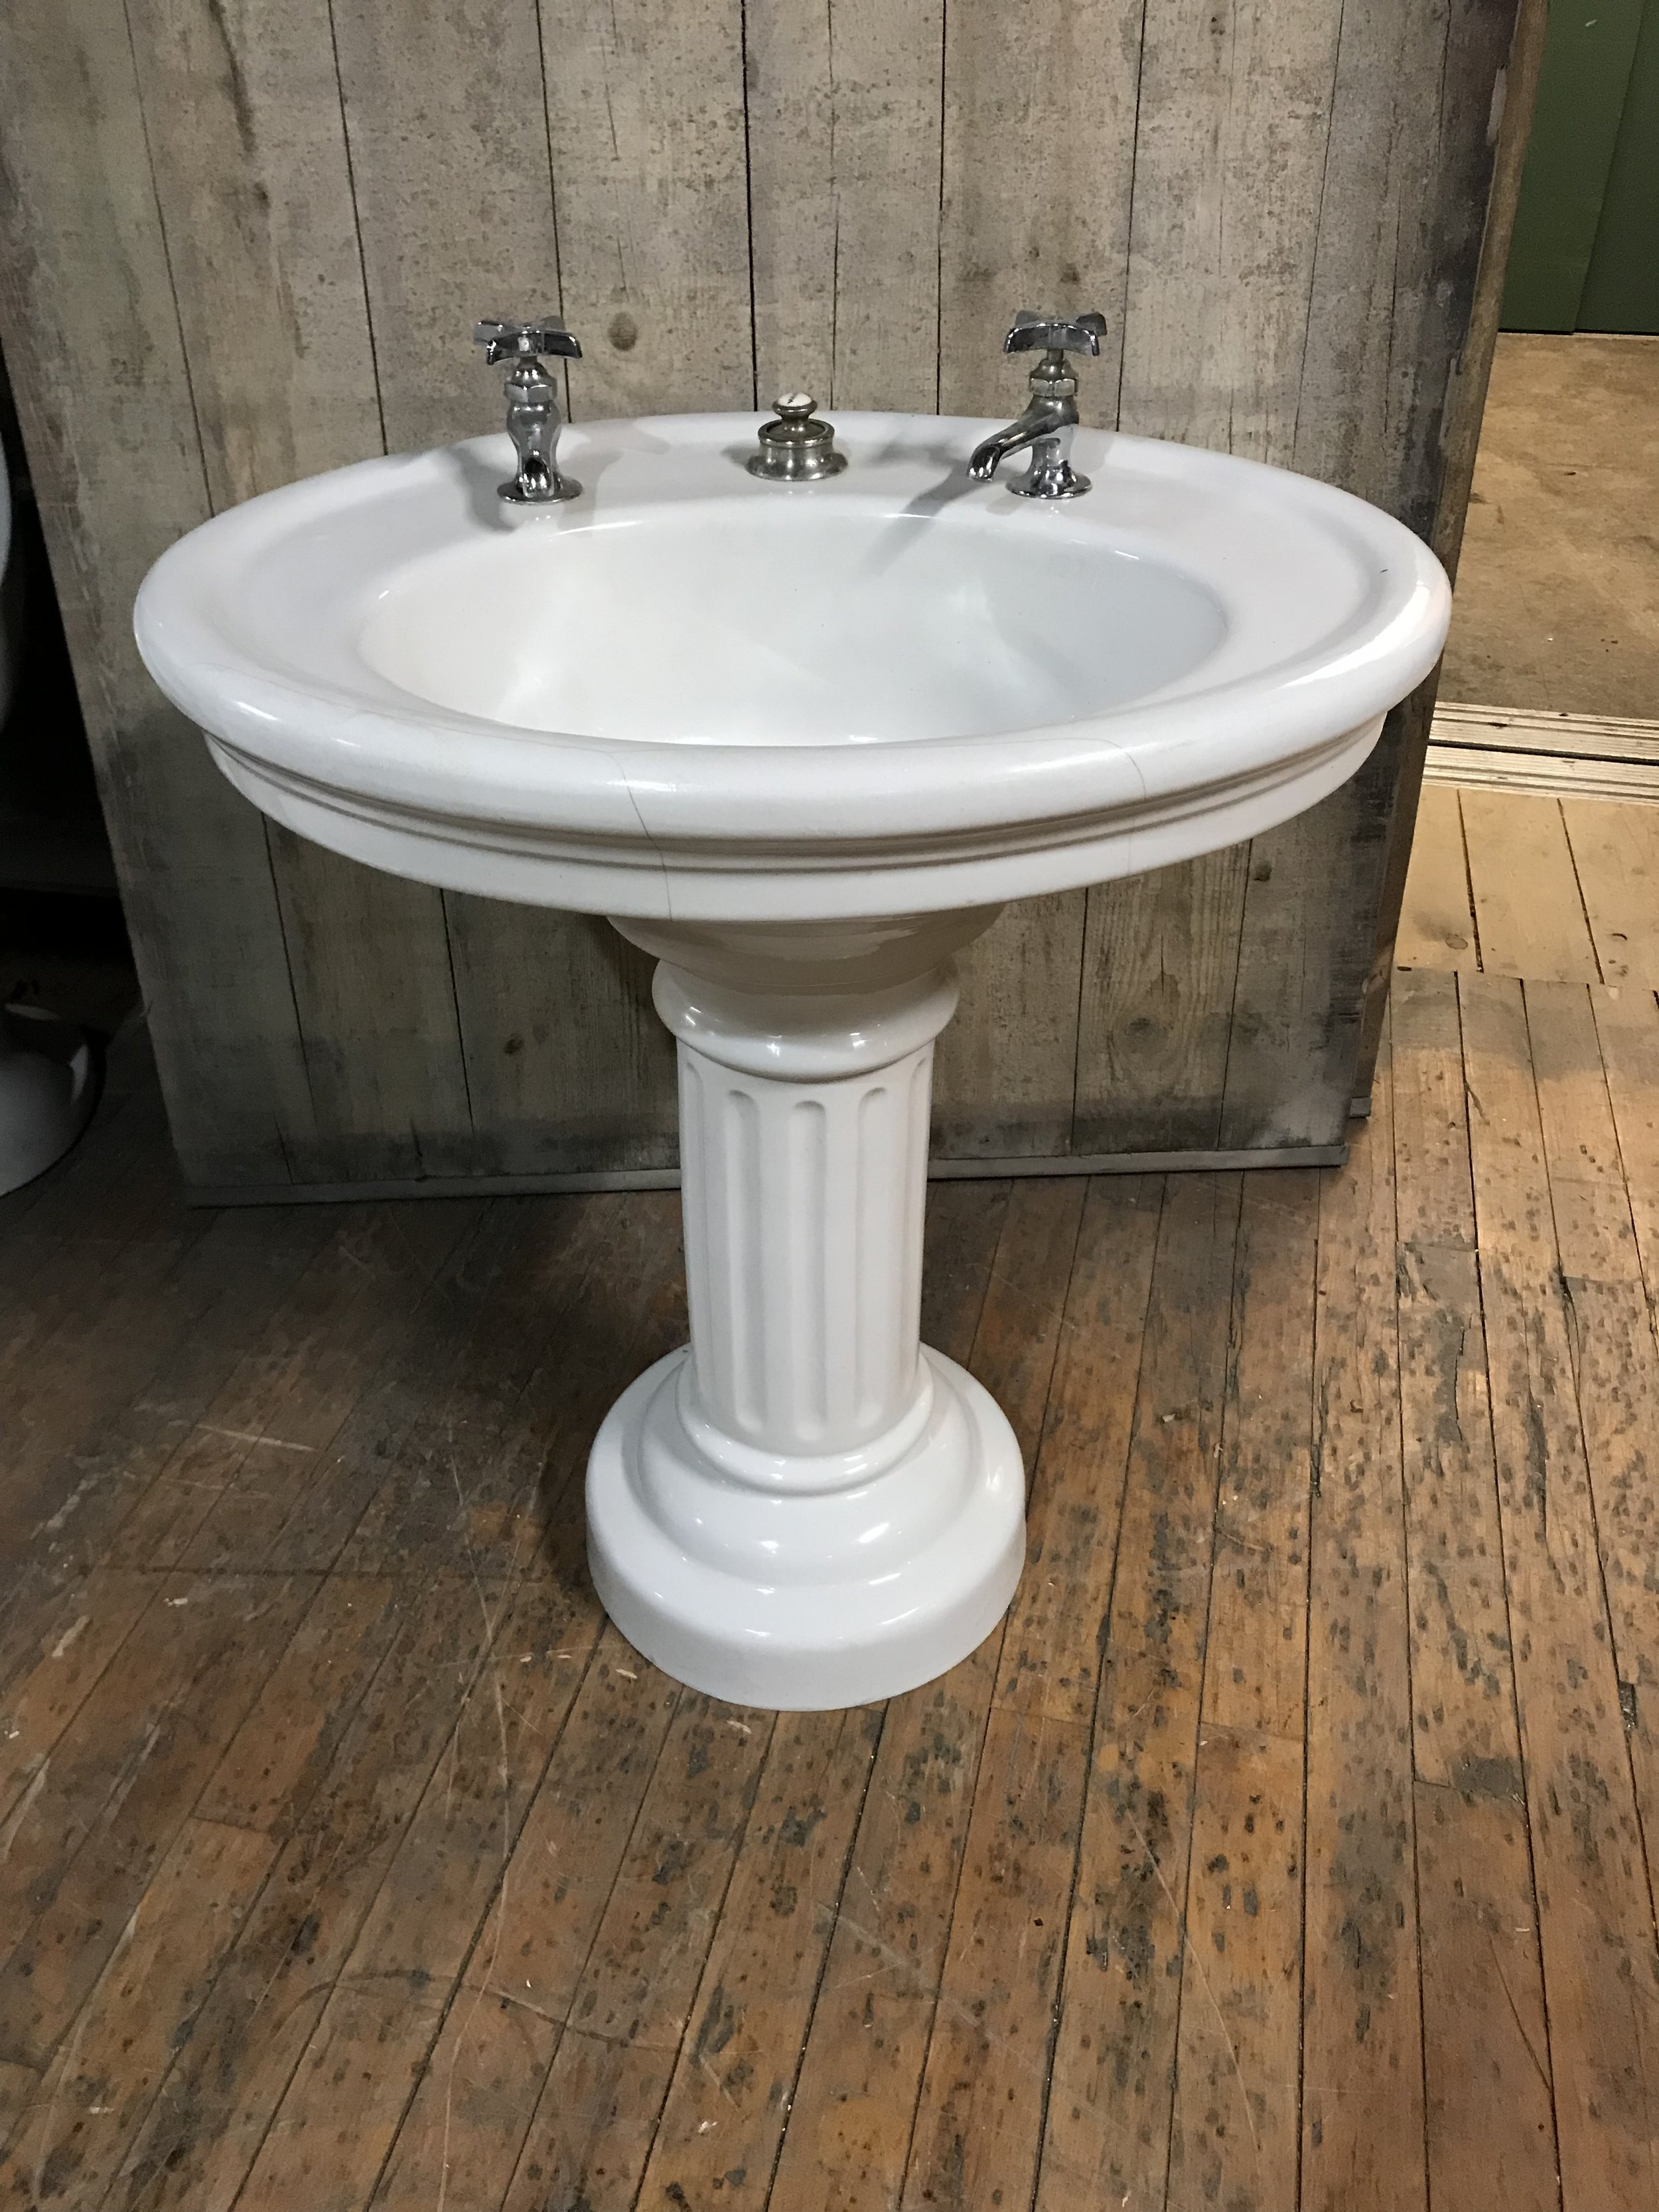 Antique vitreous China pedestal sink